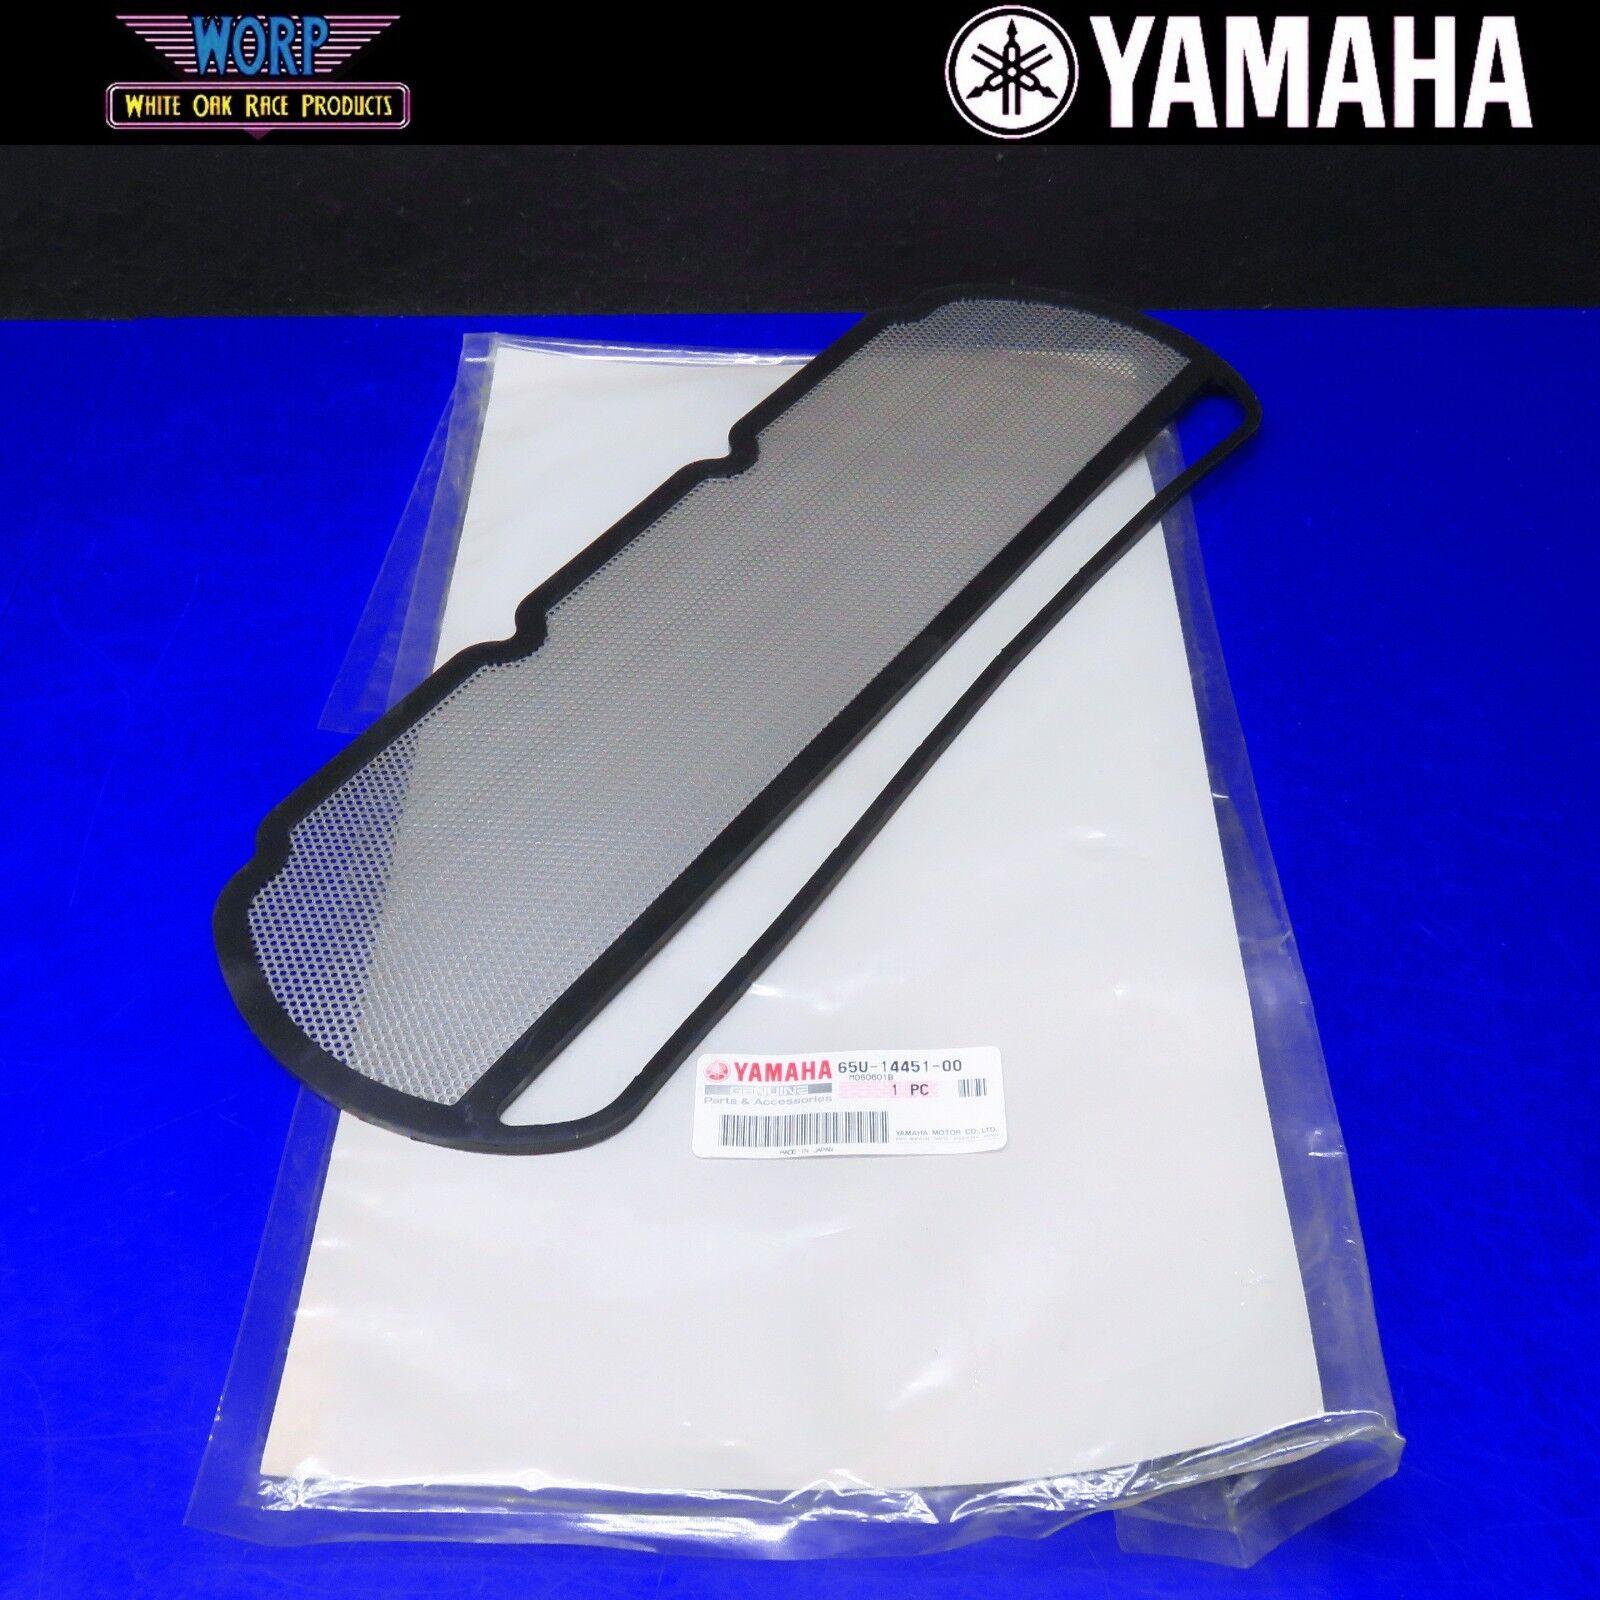 OEM YAMAHA AIR FILTER CLEANER SCREEN AR LX 210 EXCITER LS2000 65U-14451-00-00